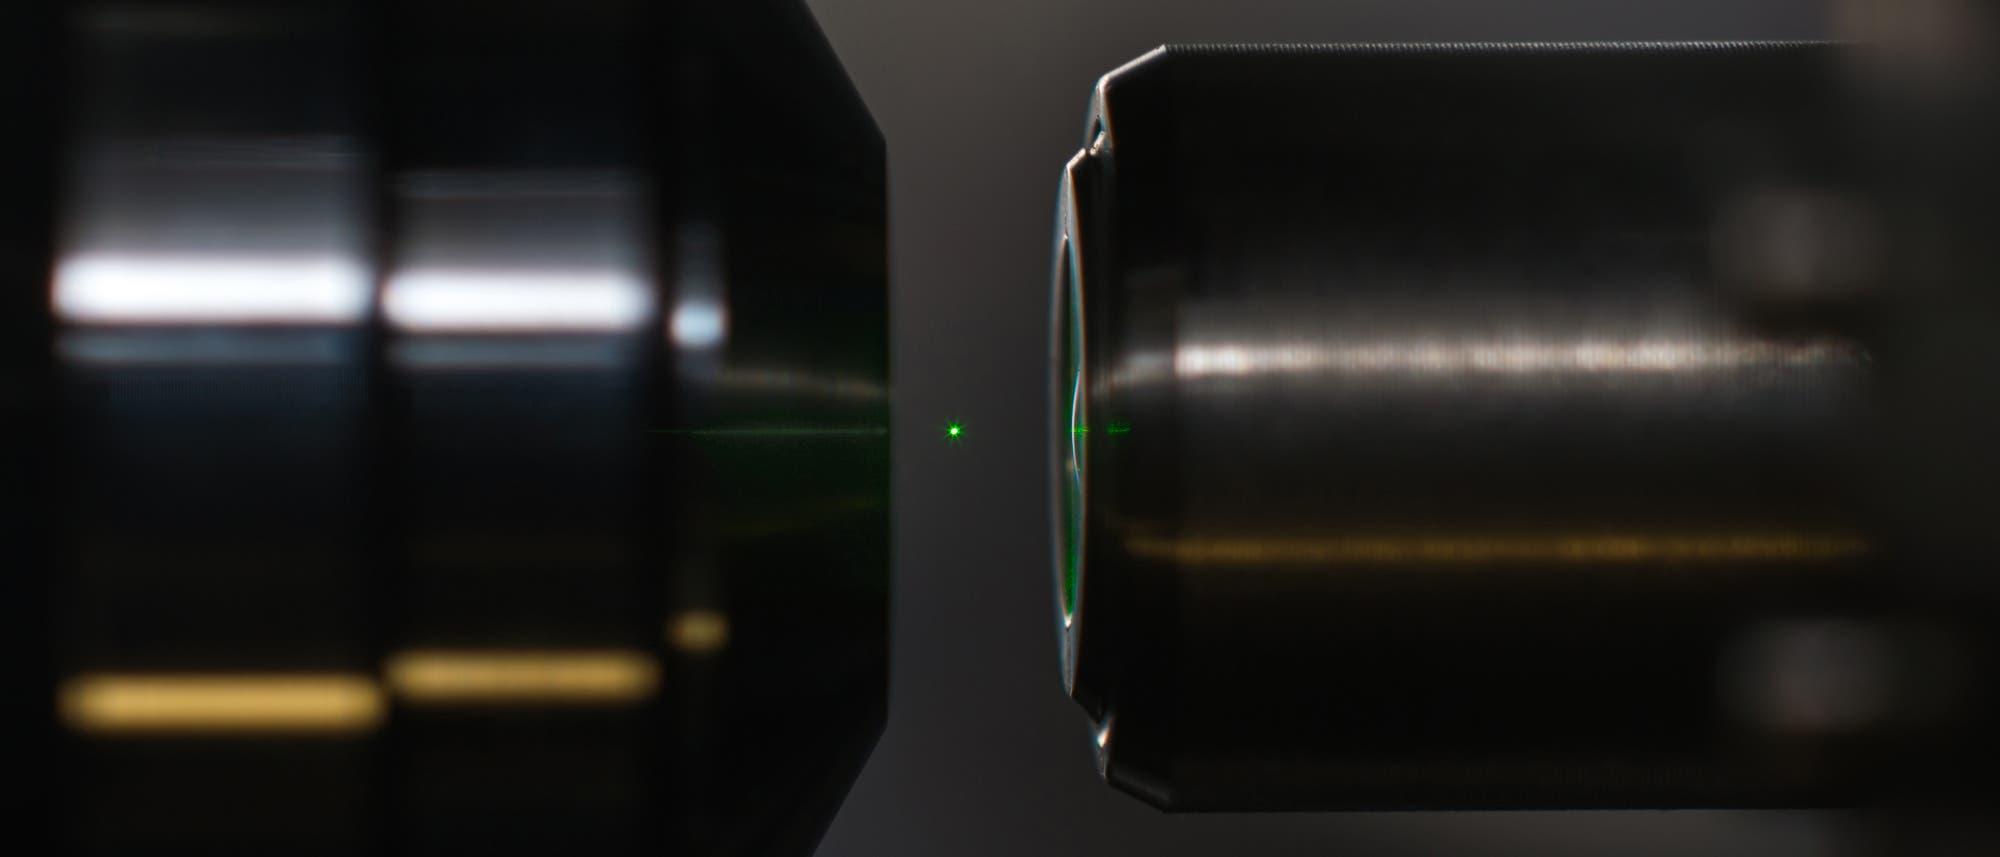 Levitierter Nanodiamant